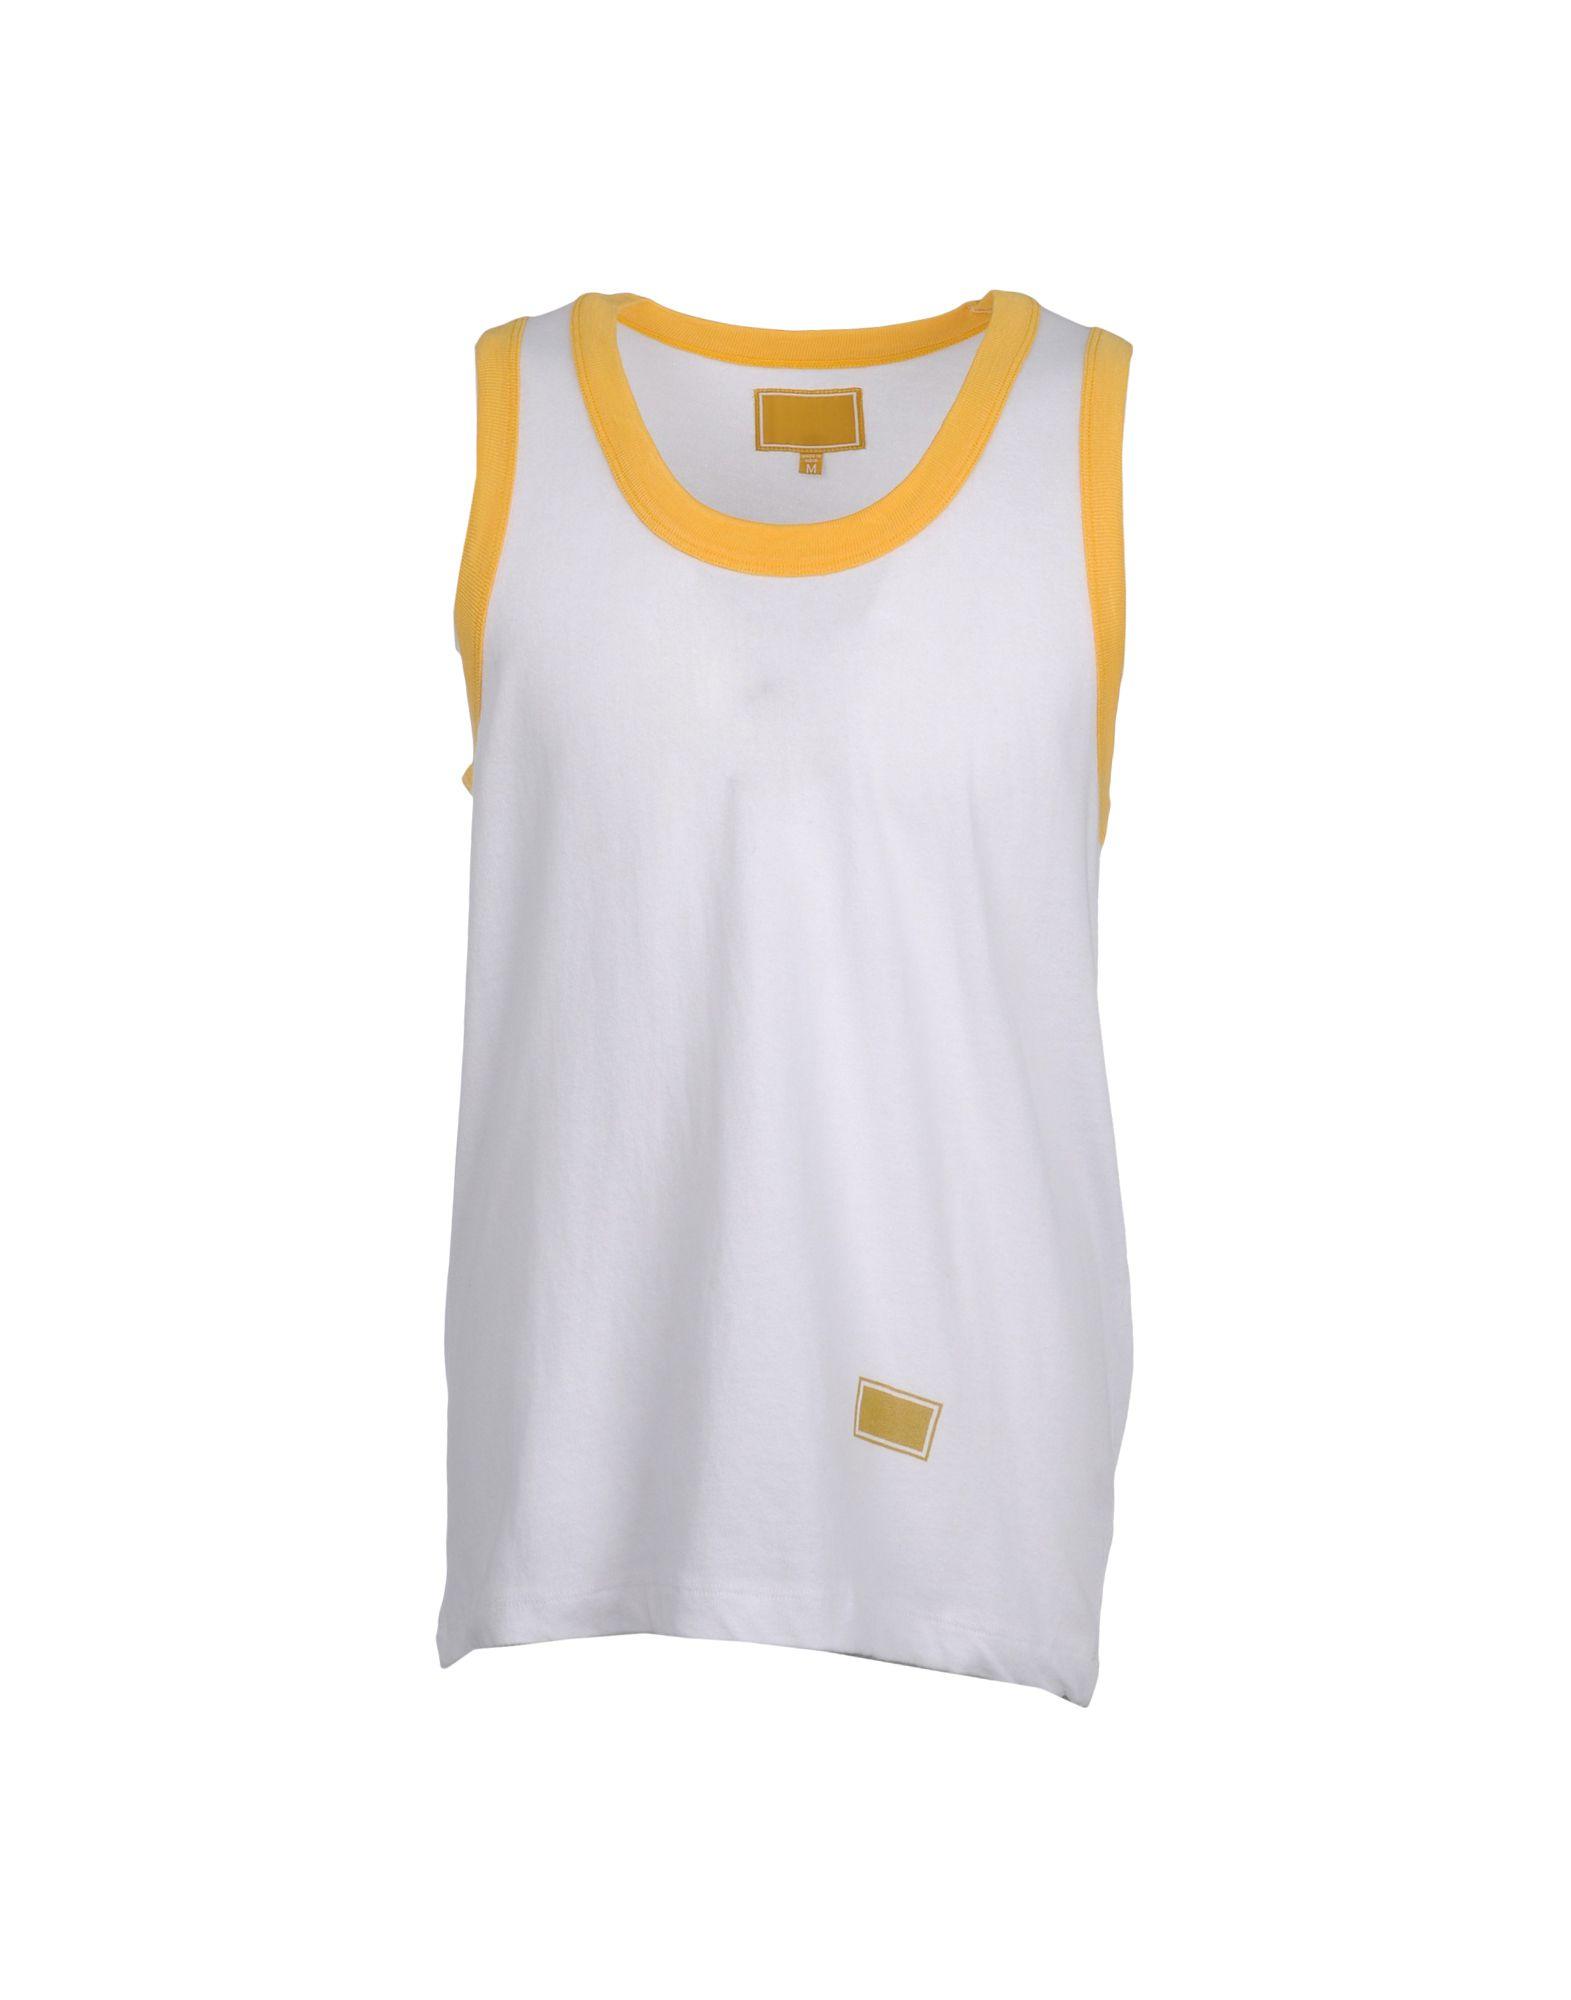 FRESHJIVE Sleeveless t-shirts